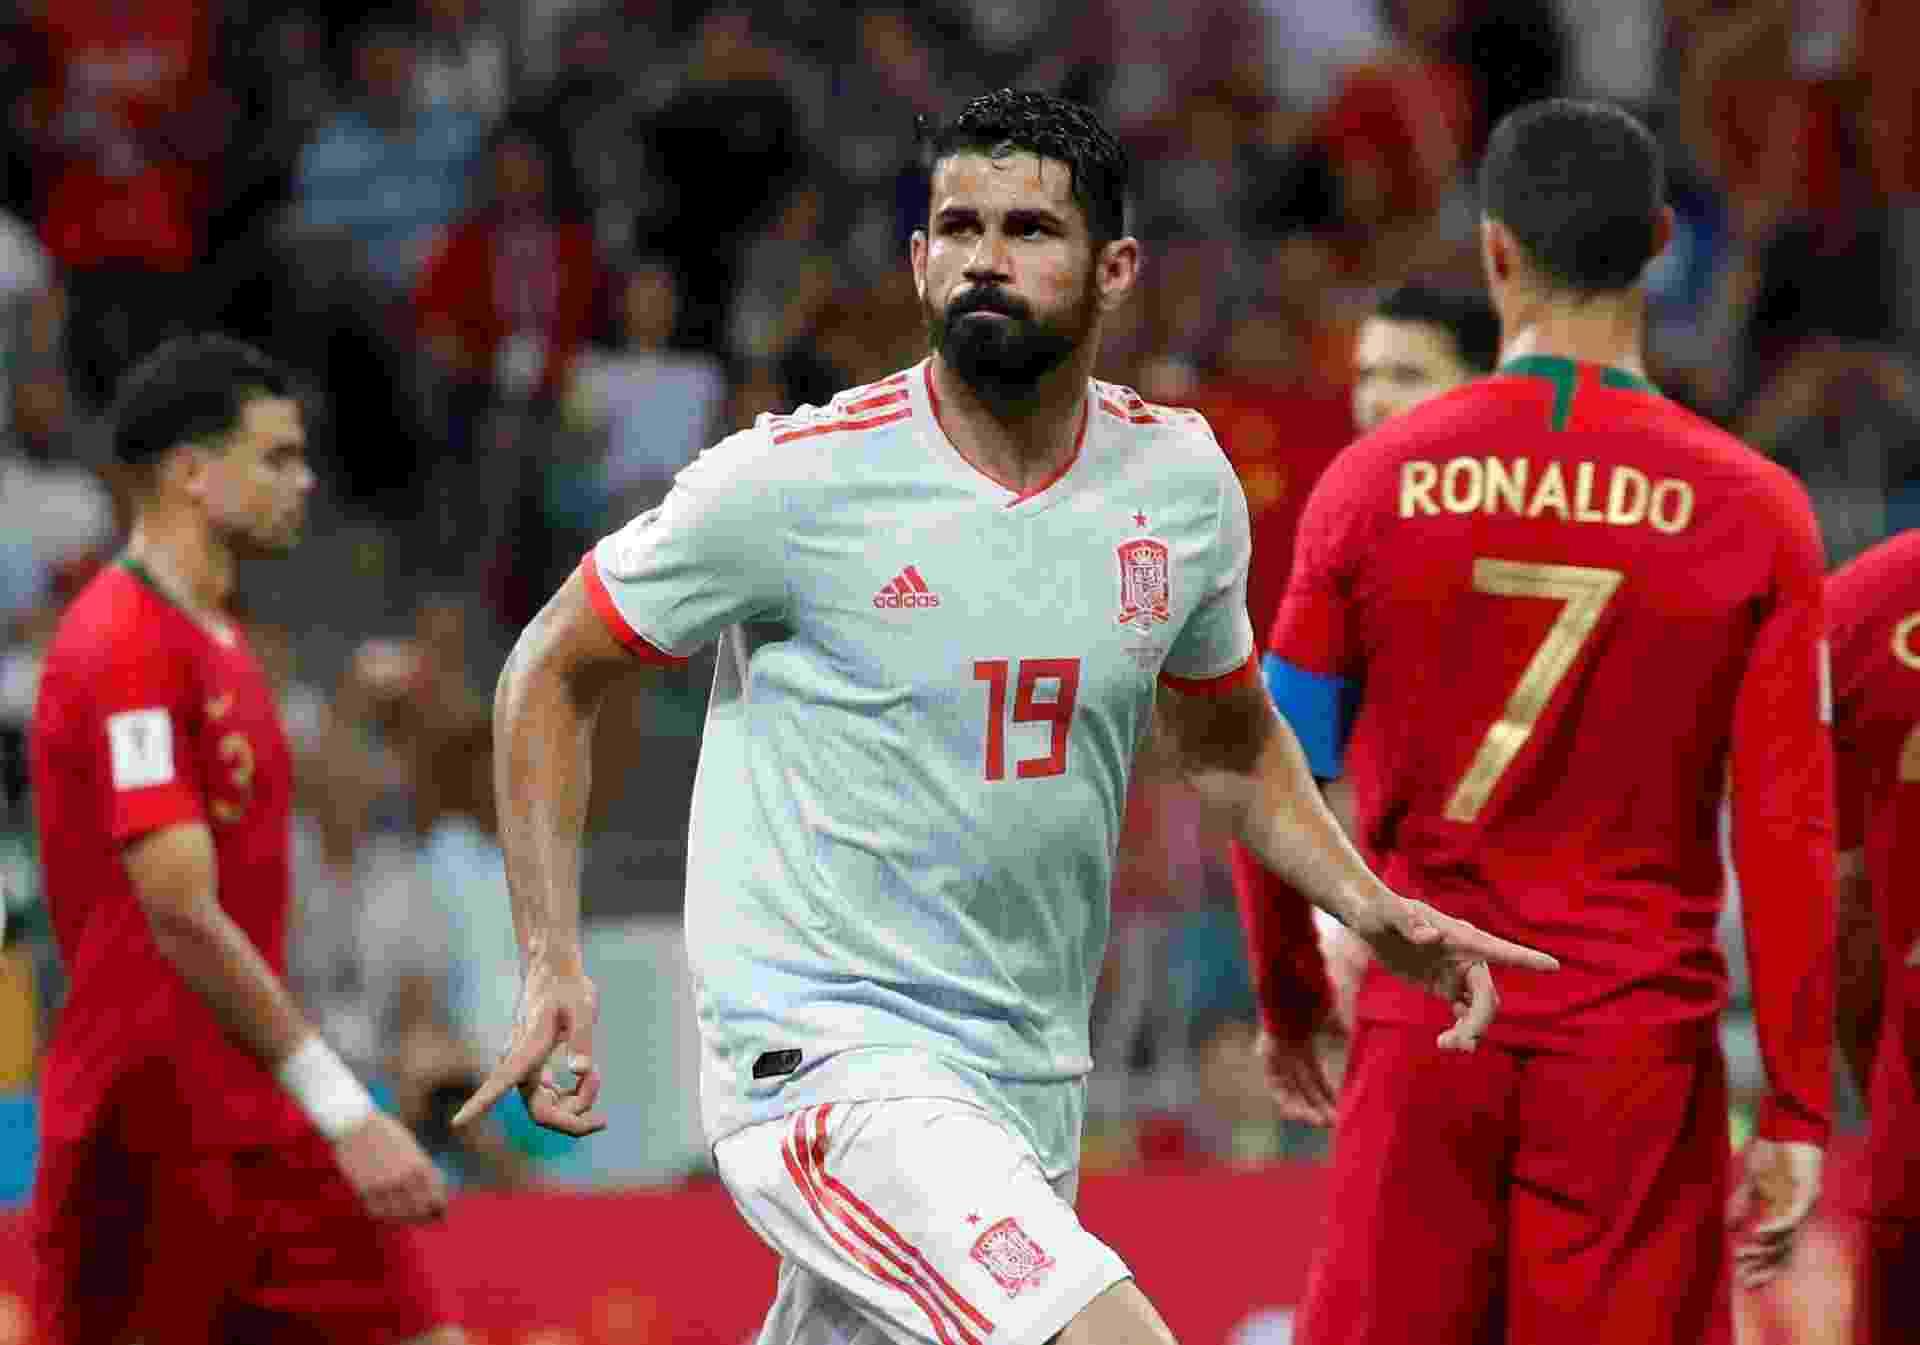 Diego Costa comemora gol da Espanha contra Portugal - undefined